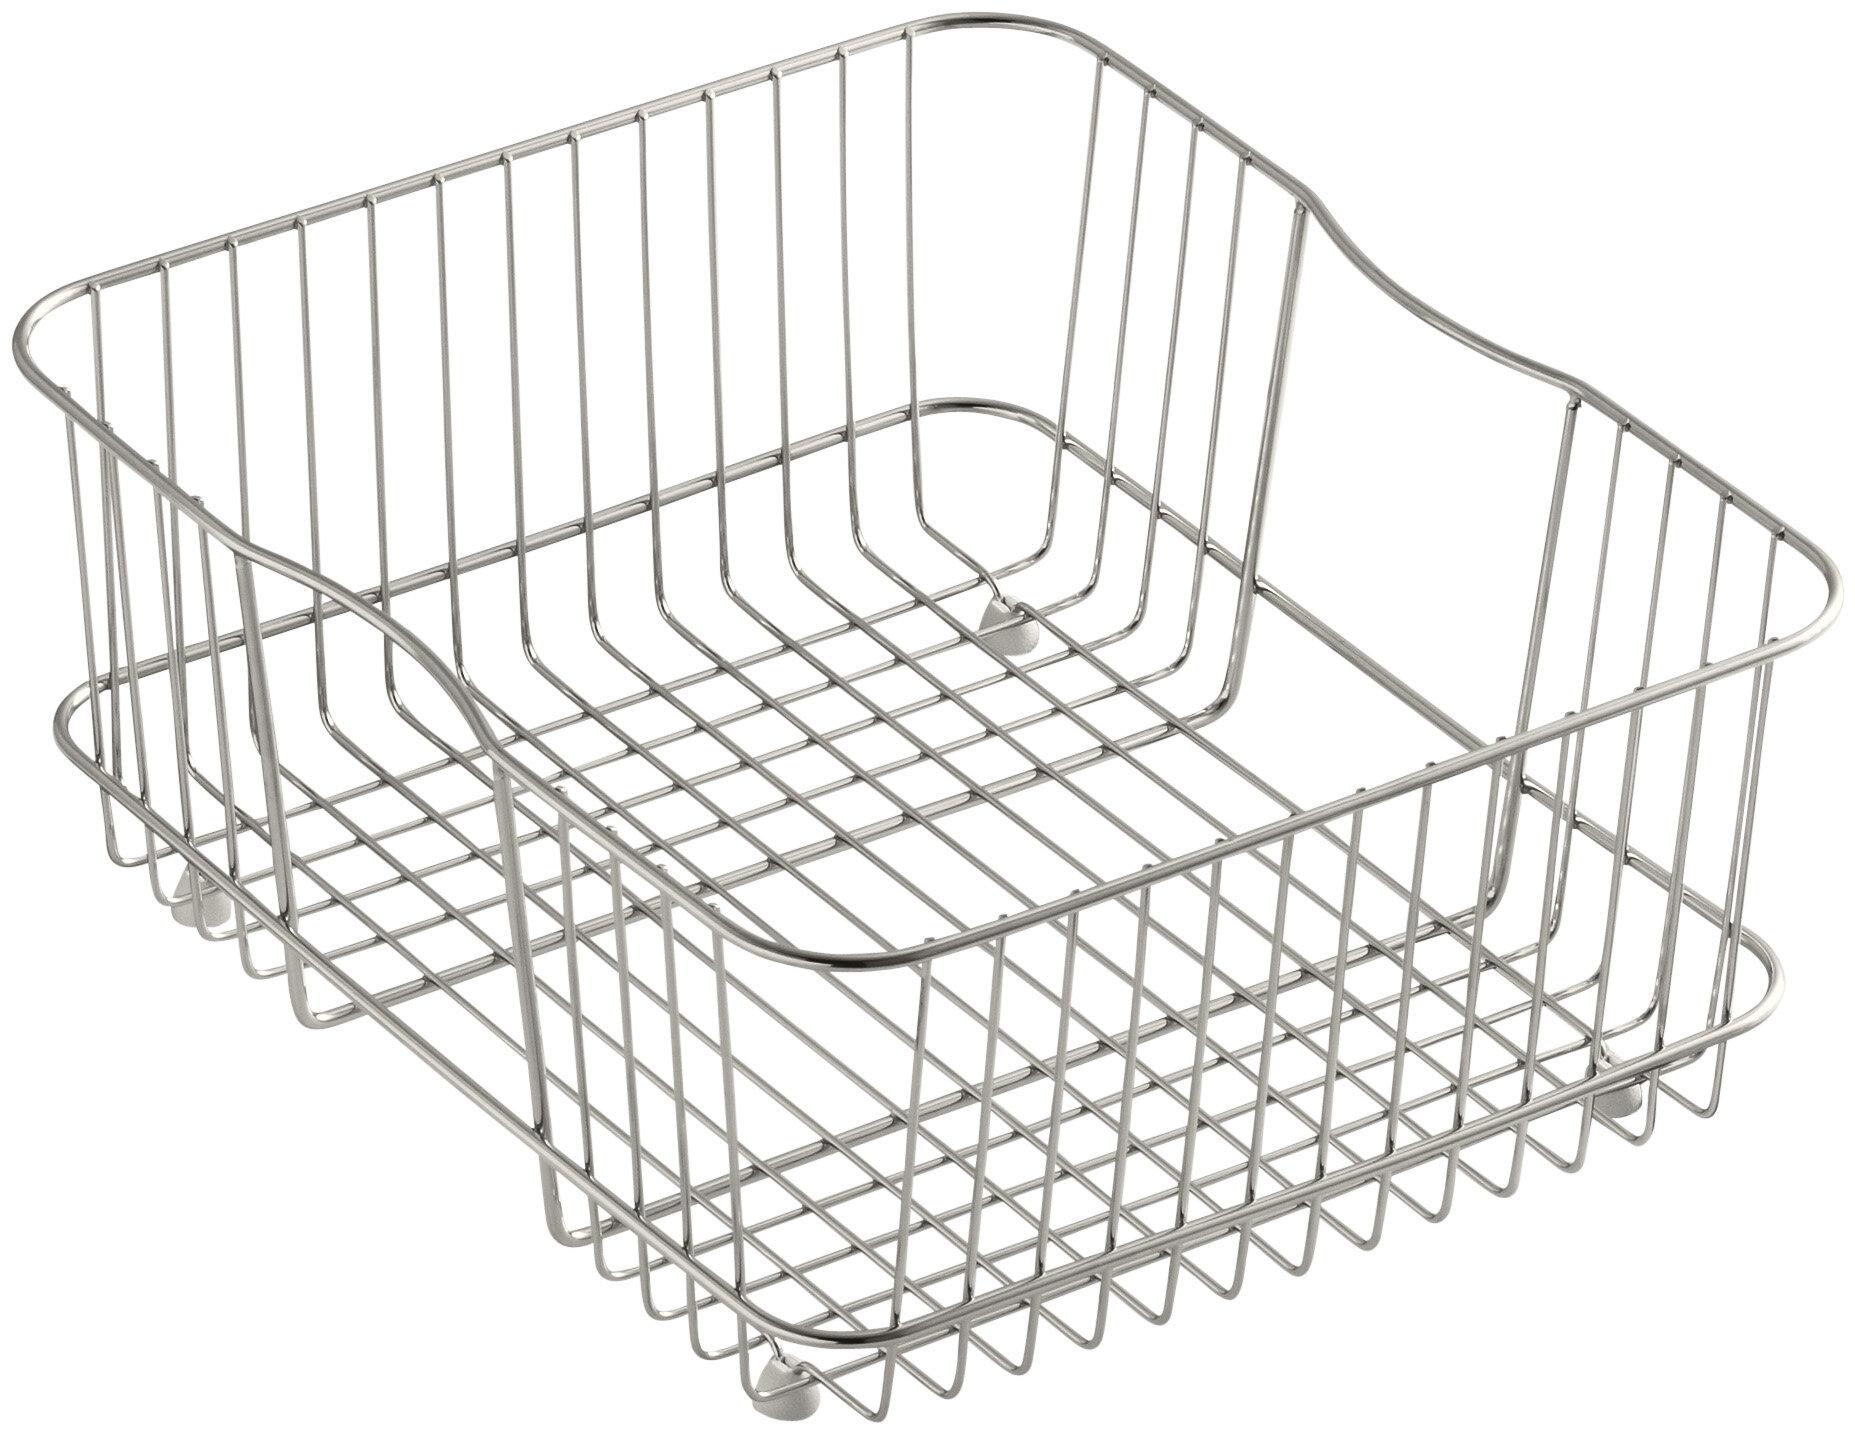 K-3277-ST Kohler Coated Sink Basket for Undertone and Iron/Tones ...